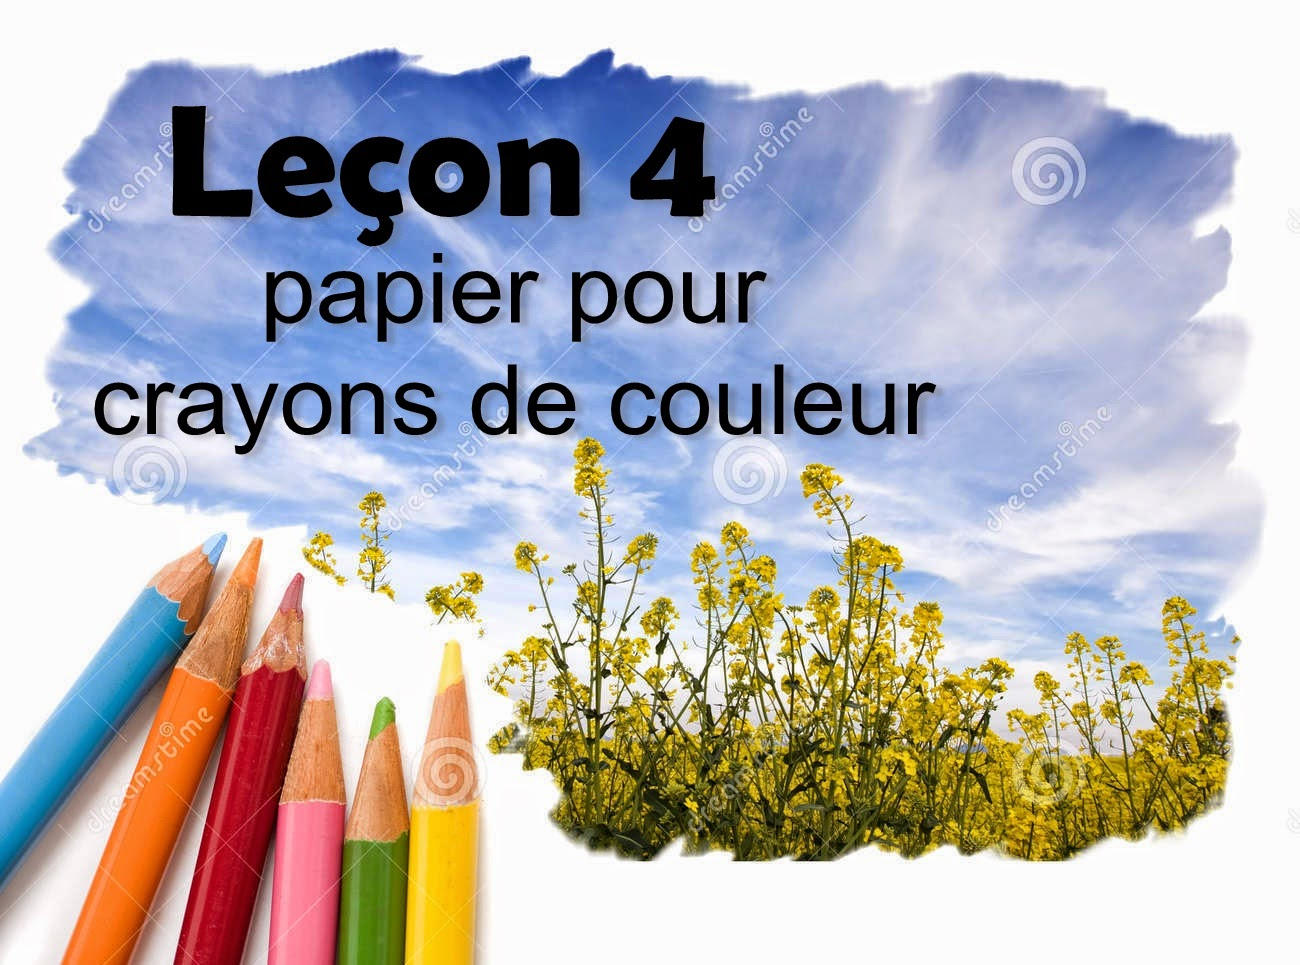 Tuto Dessin Dessin Aux Crayons De Couleur Tuto Dessin Lecon 4